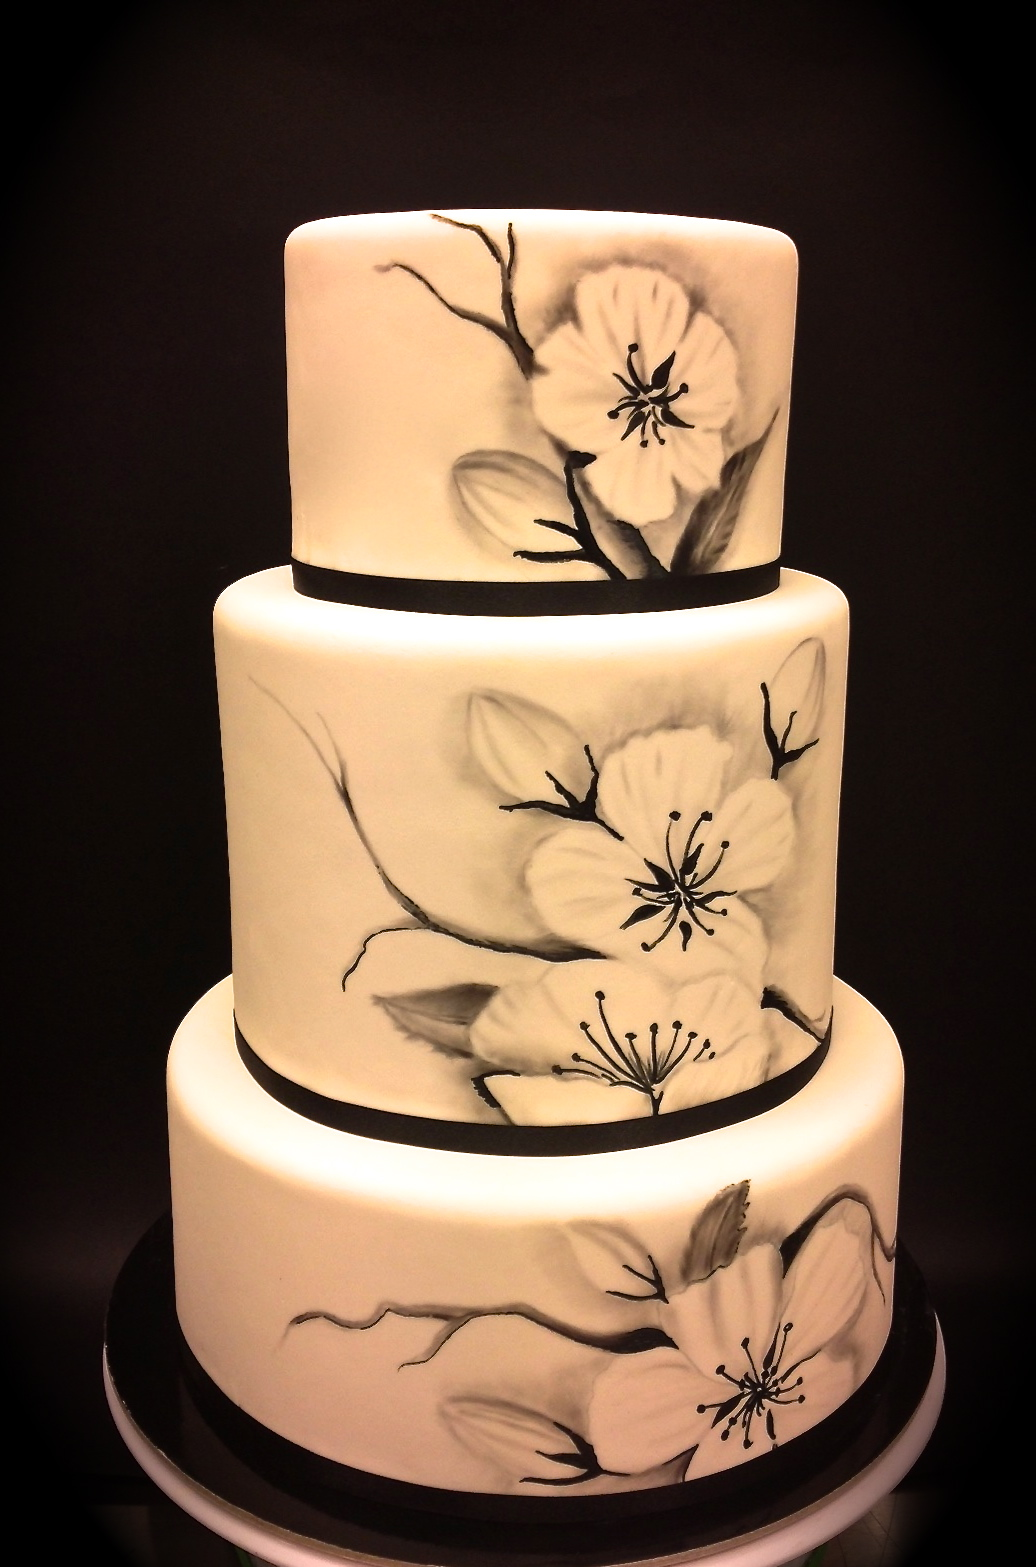 Cake Designer: Torta Tattoo